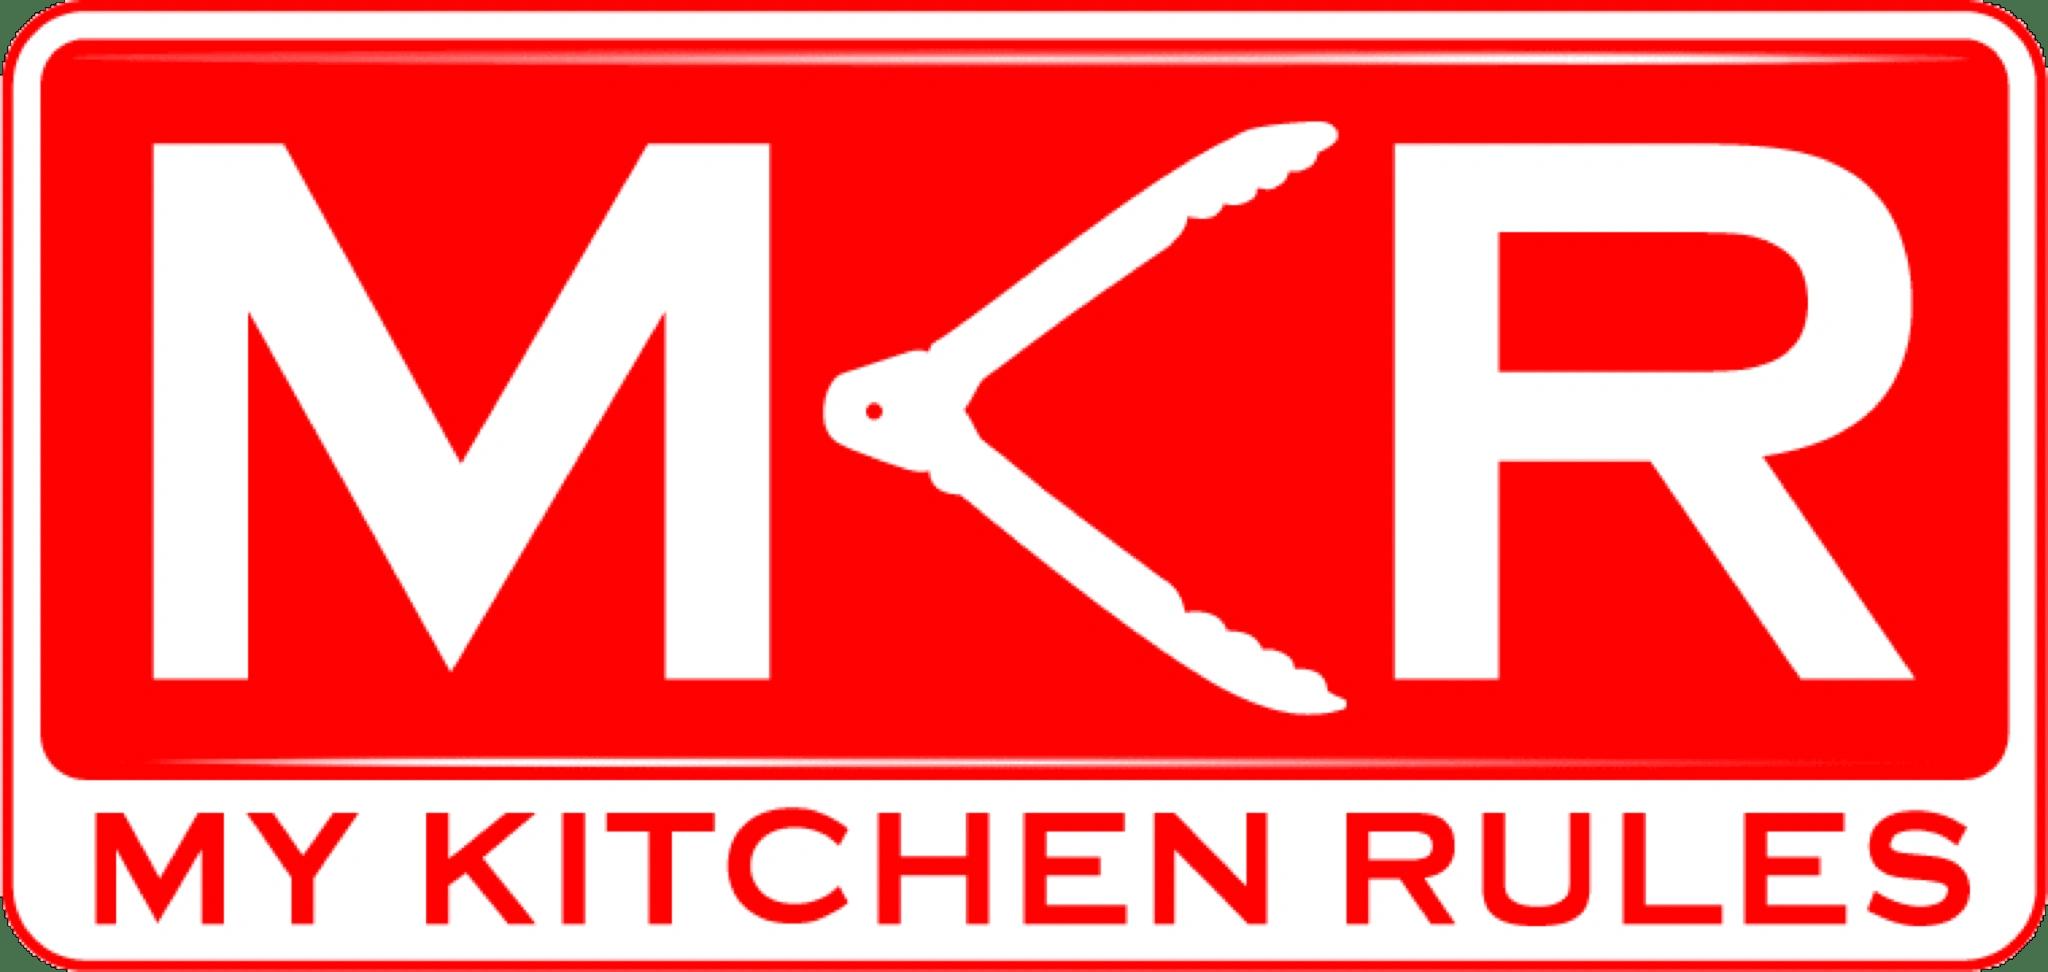 Image  My Kitchen Rules Logopng  Logopedia  FANDOM